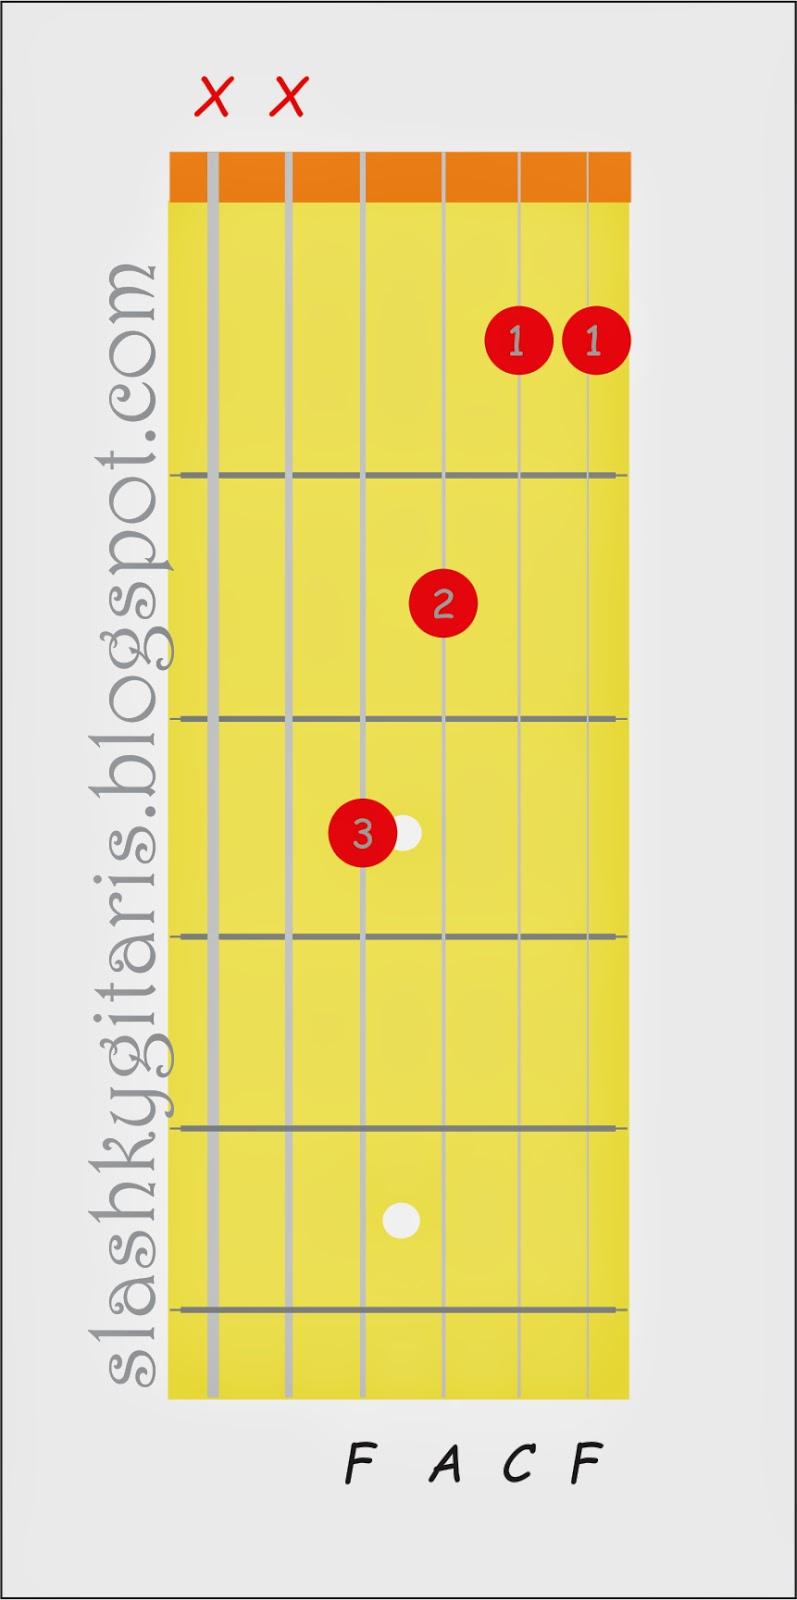 kunci gitar, chord gitar, kunci gitar peterpan, kunci gitar ungu, kunci gitar last child, kunci dasar gitar, cord gitar, gitar akustik, cara bermain gitar, kunci gitar armada, kord gitar, belajar gitar, kunci F mayor